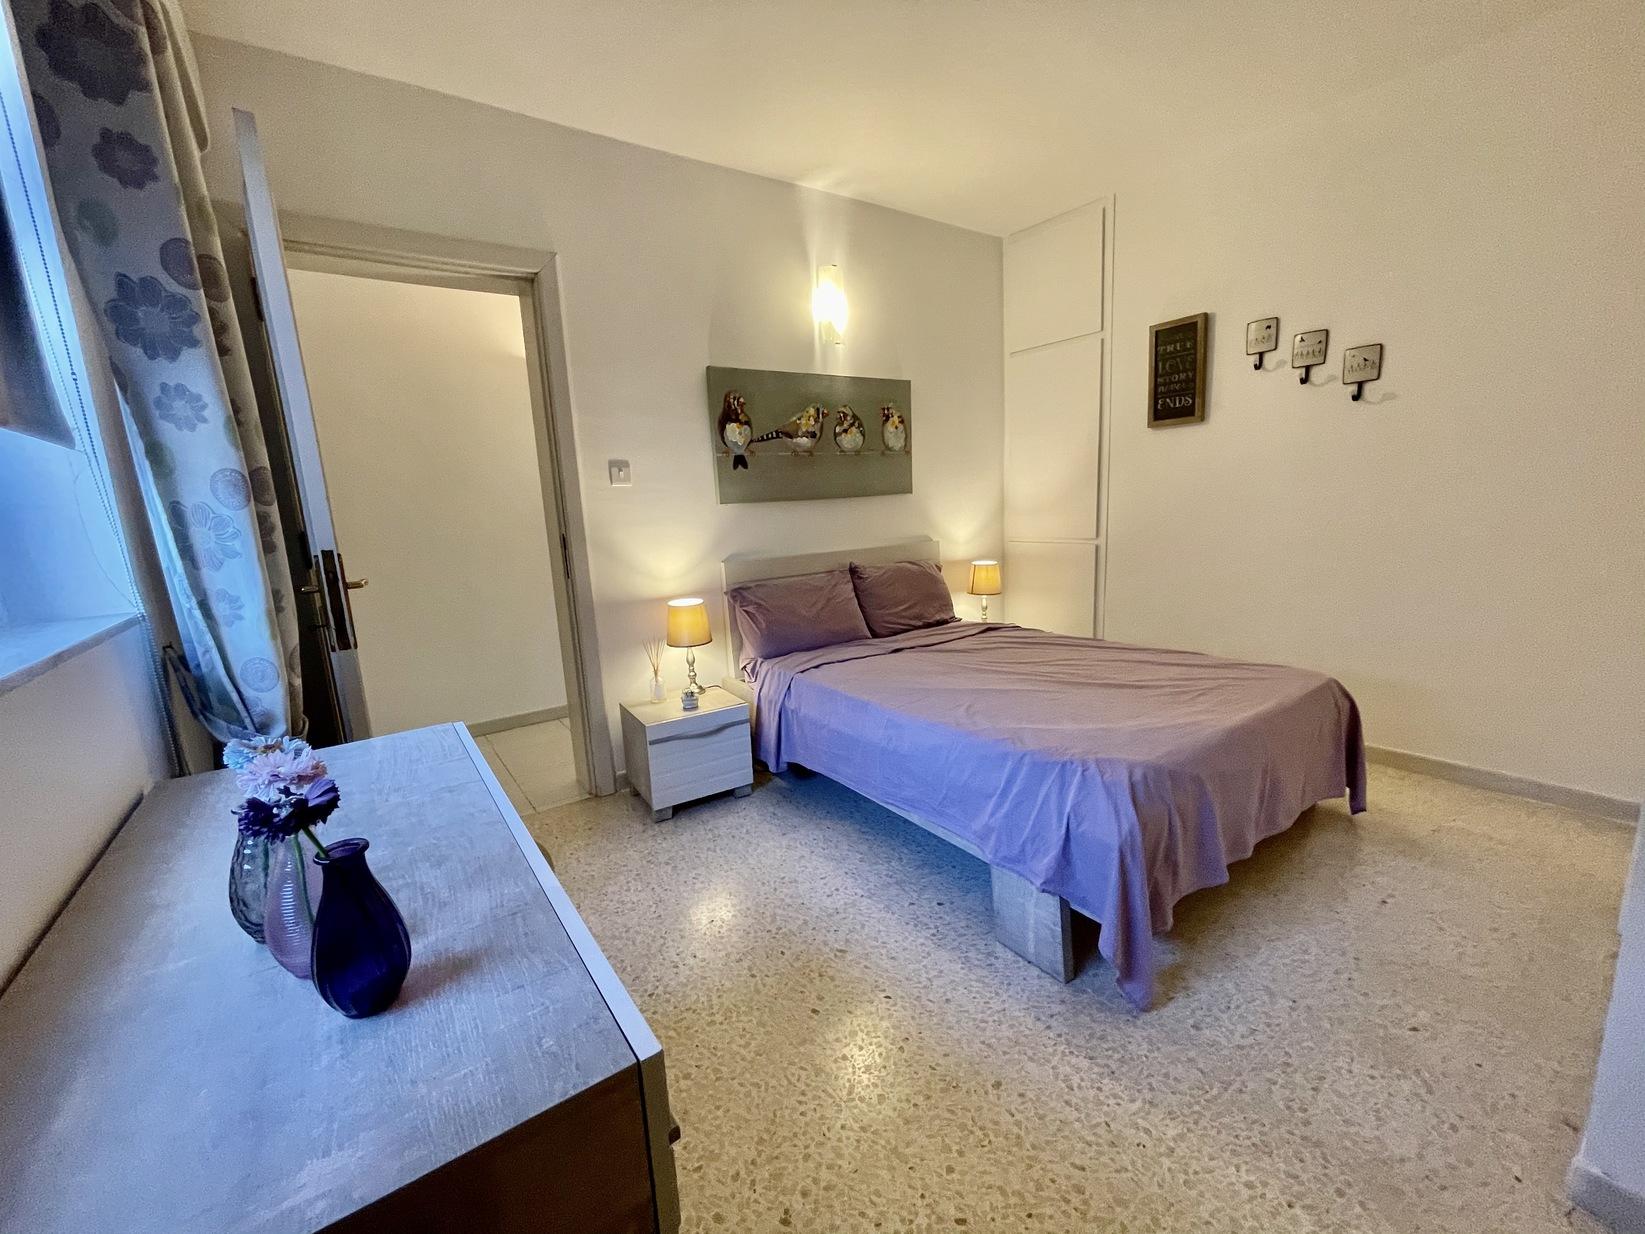 2 bed Apartment For Rent in Sliema, Sliema - thumb 17